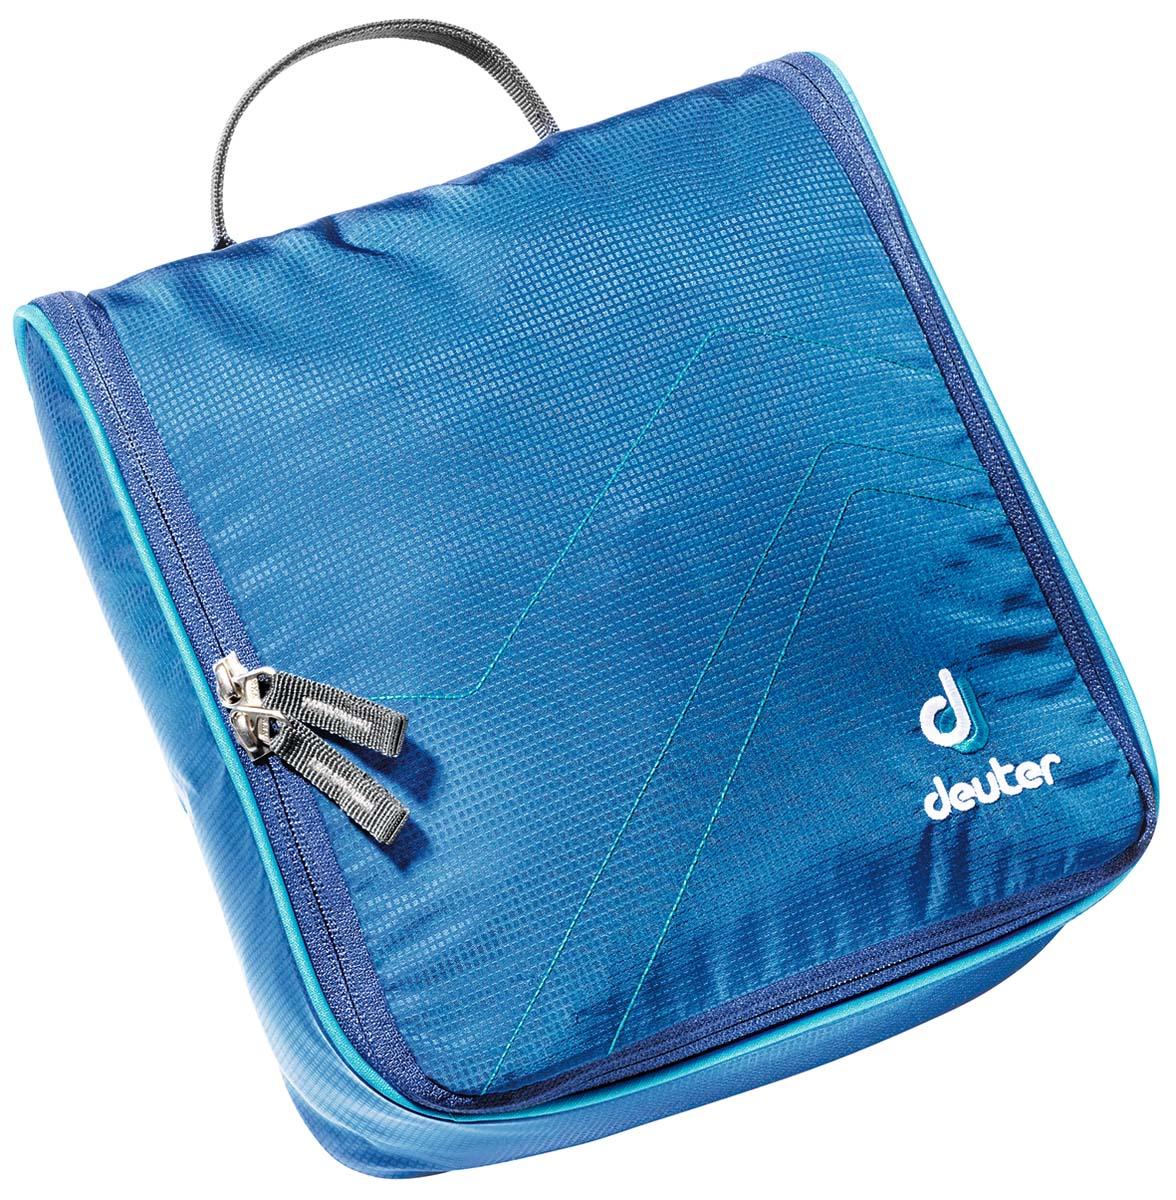 "Косметичка Deuter ""Accessories Wash Center II"", цвет: светло-голубой, бирюзовый, 25 см х 24 см х 9 см 39464_3306"